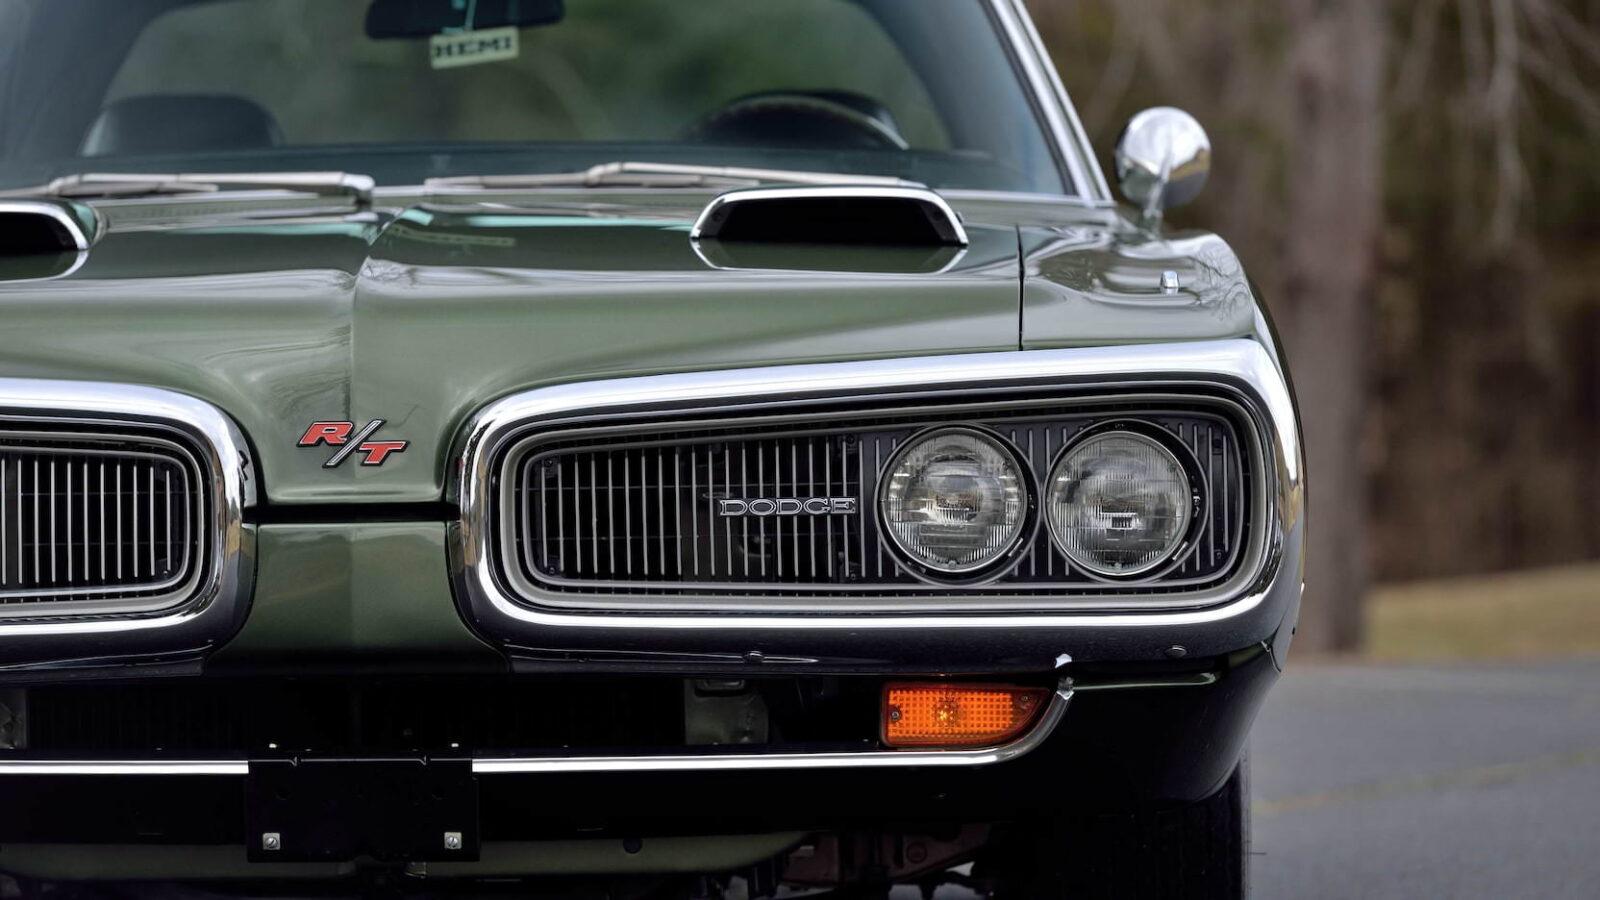 Dodge Hemi Coronet RT Hemi 426 Headlights